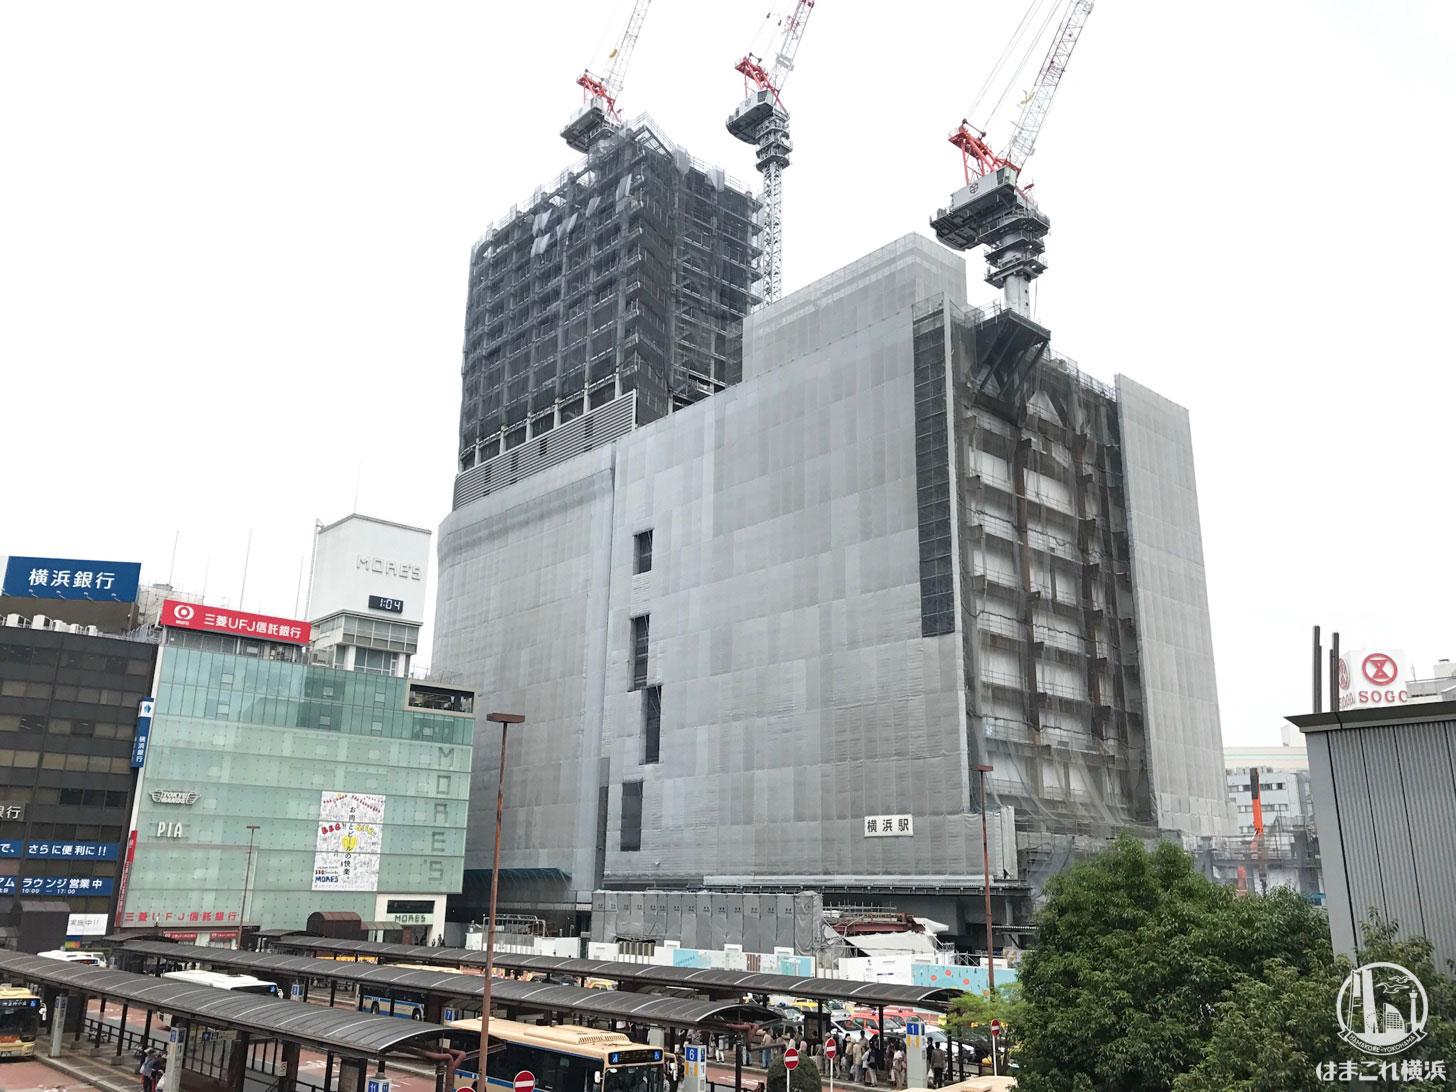 2018年6月 横浜駅西口の様子